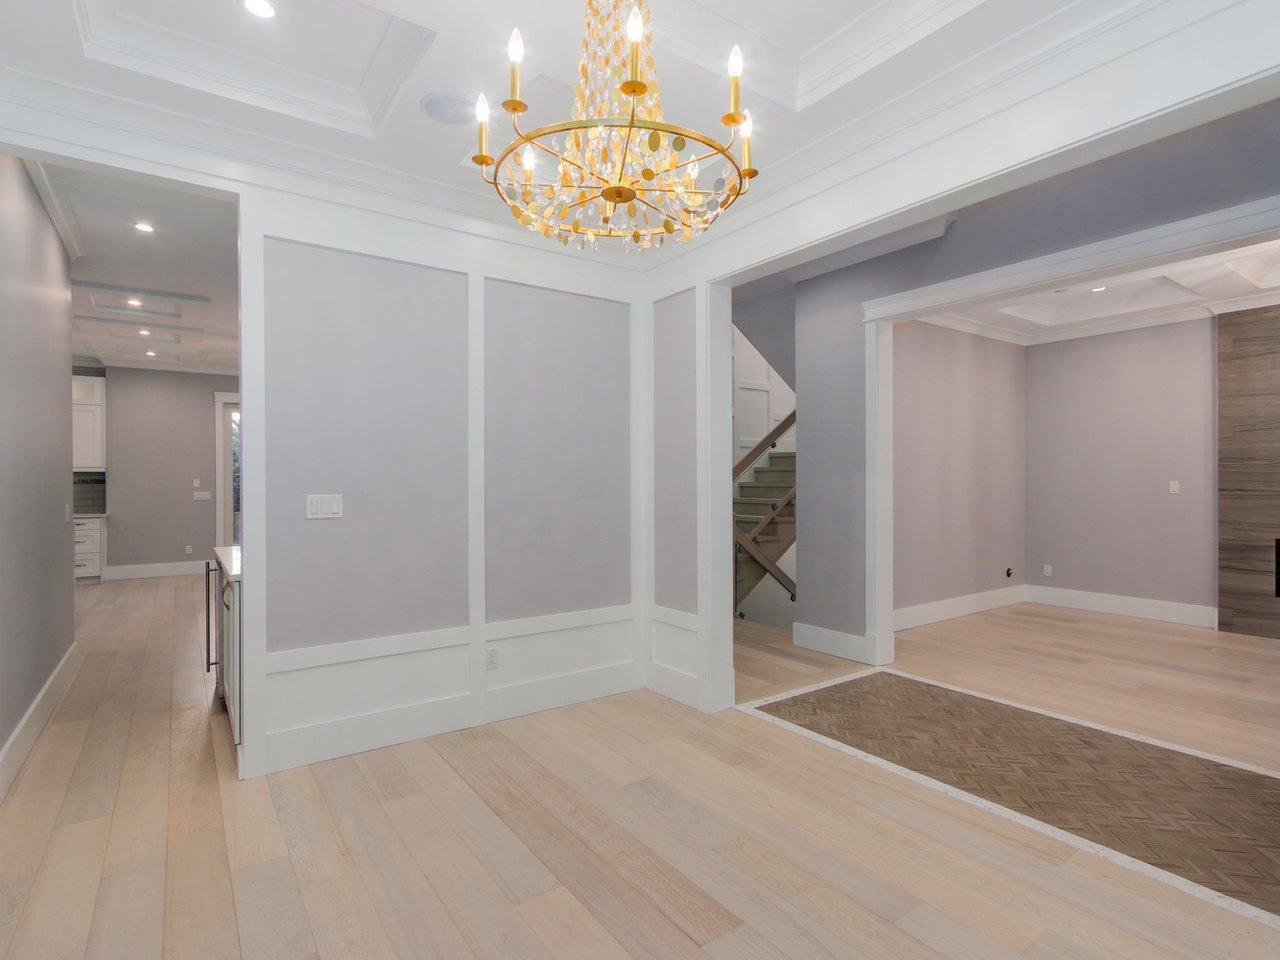 Photo 5: Photos: 1560 MAPLE Street: White Rock House for sale (South Surrey White Rock)  : MLS®# R2138926